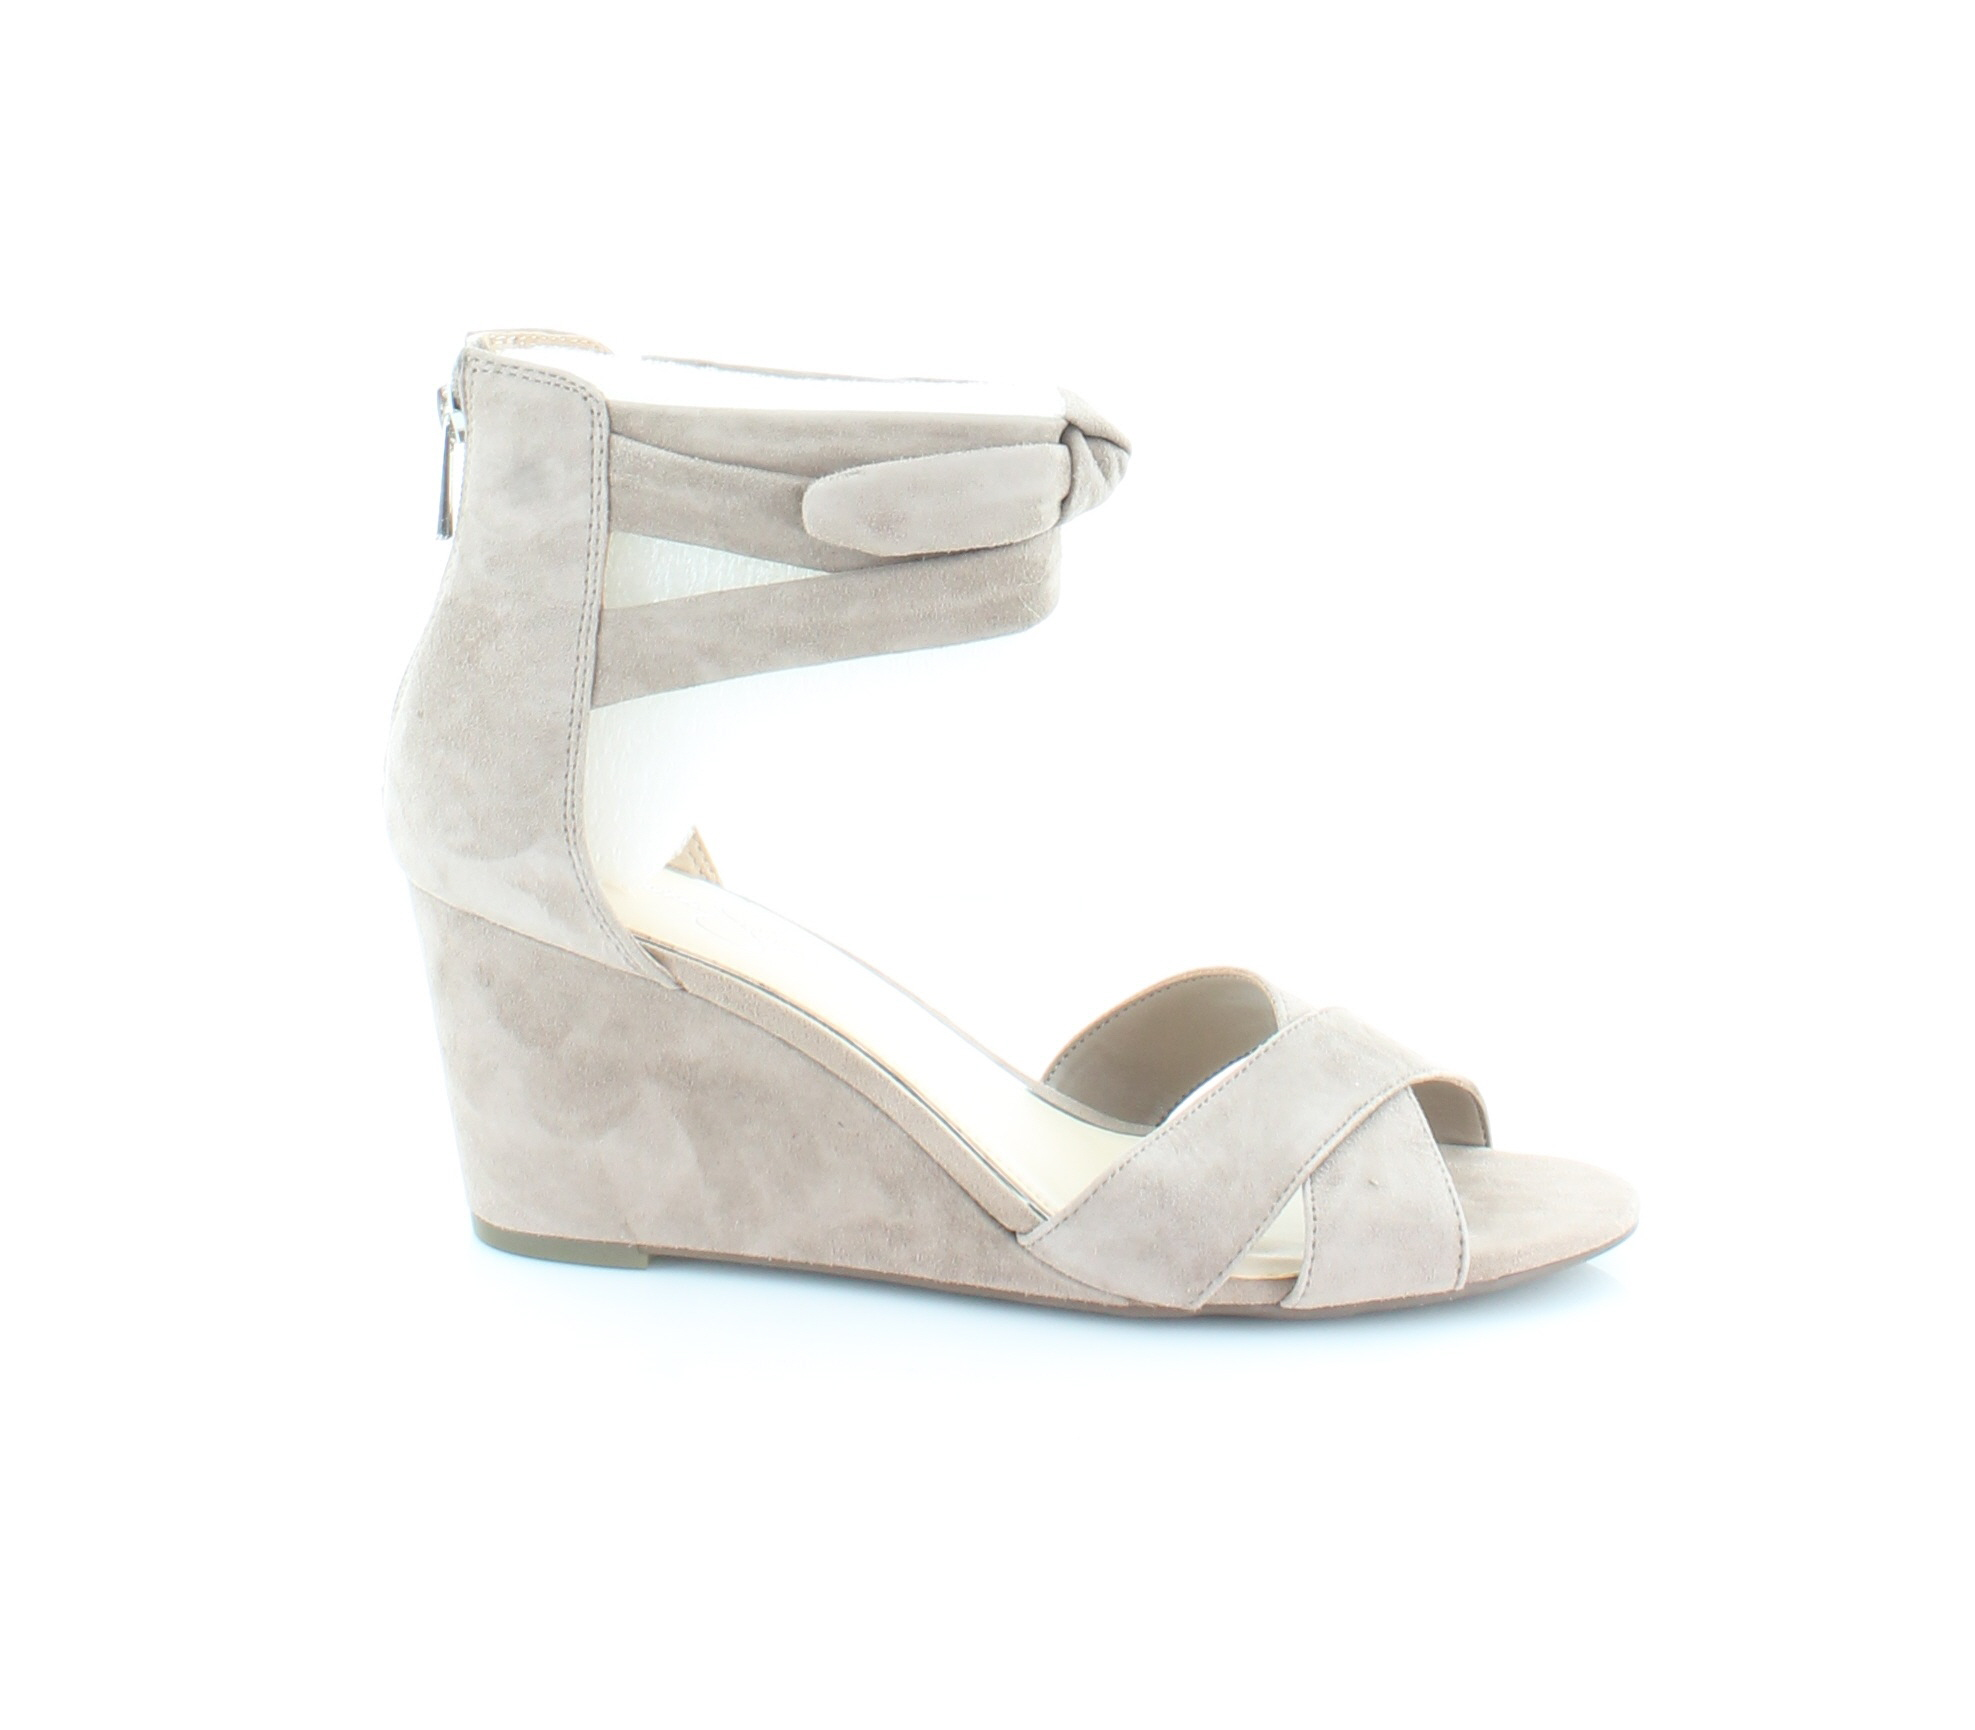 c5dde405c5c6 Image is loading Jessica-Simpson-Cyrena-Women-039-s-Sandals-Warm-